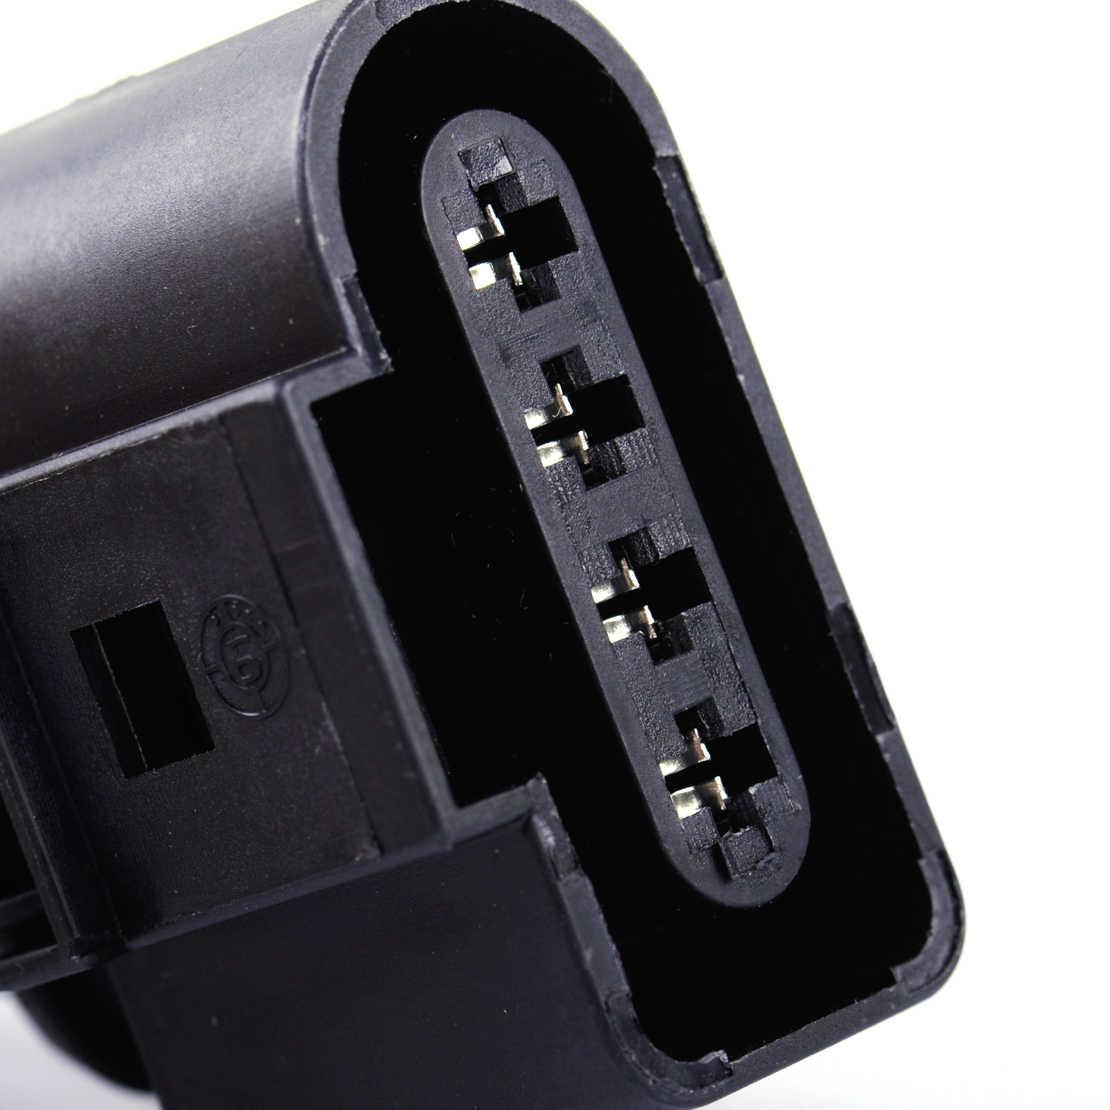 dwcx car 6pcs 4 pin ignition coil wiring connector plug 1j0973724 fit for audi a4 a6  [ 1110 x 1110 Pixel ]